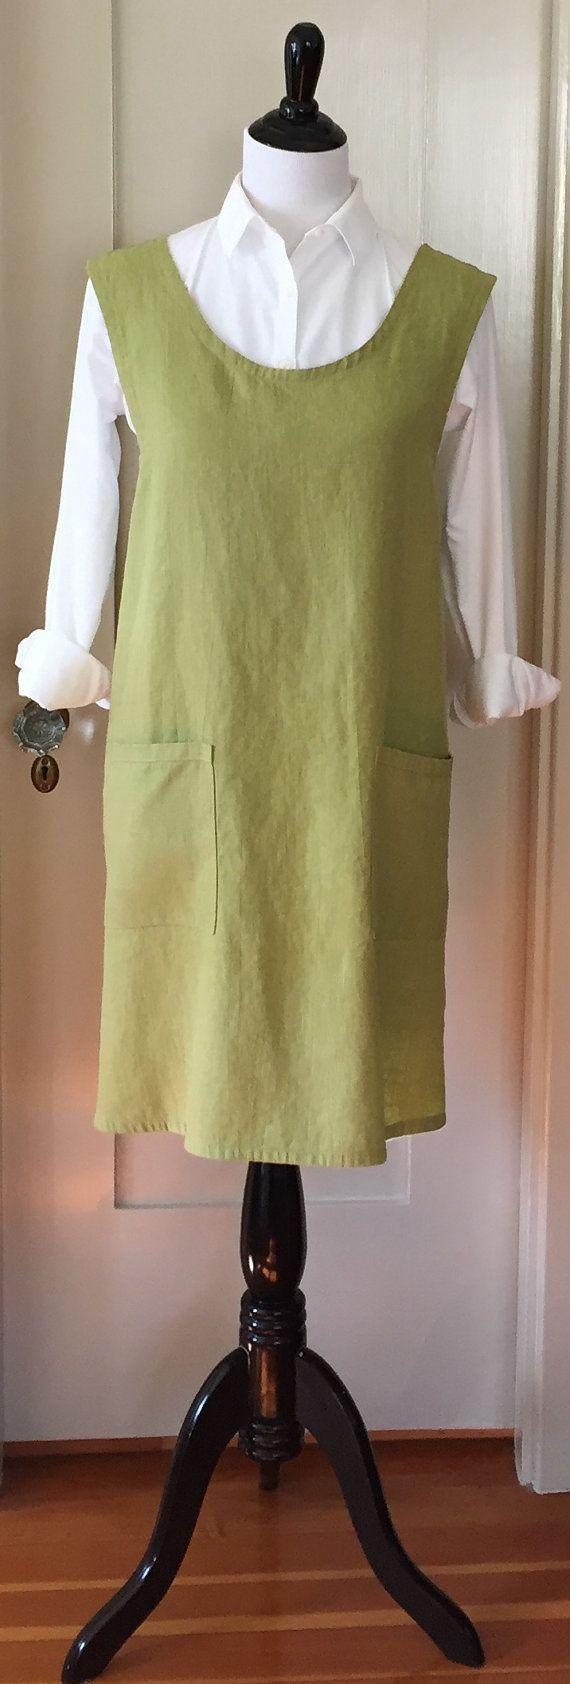 Washed Linen, Curved Cross Back, Japanese Apron, Smock